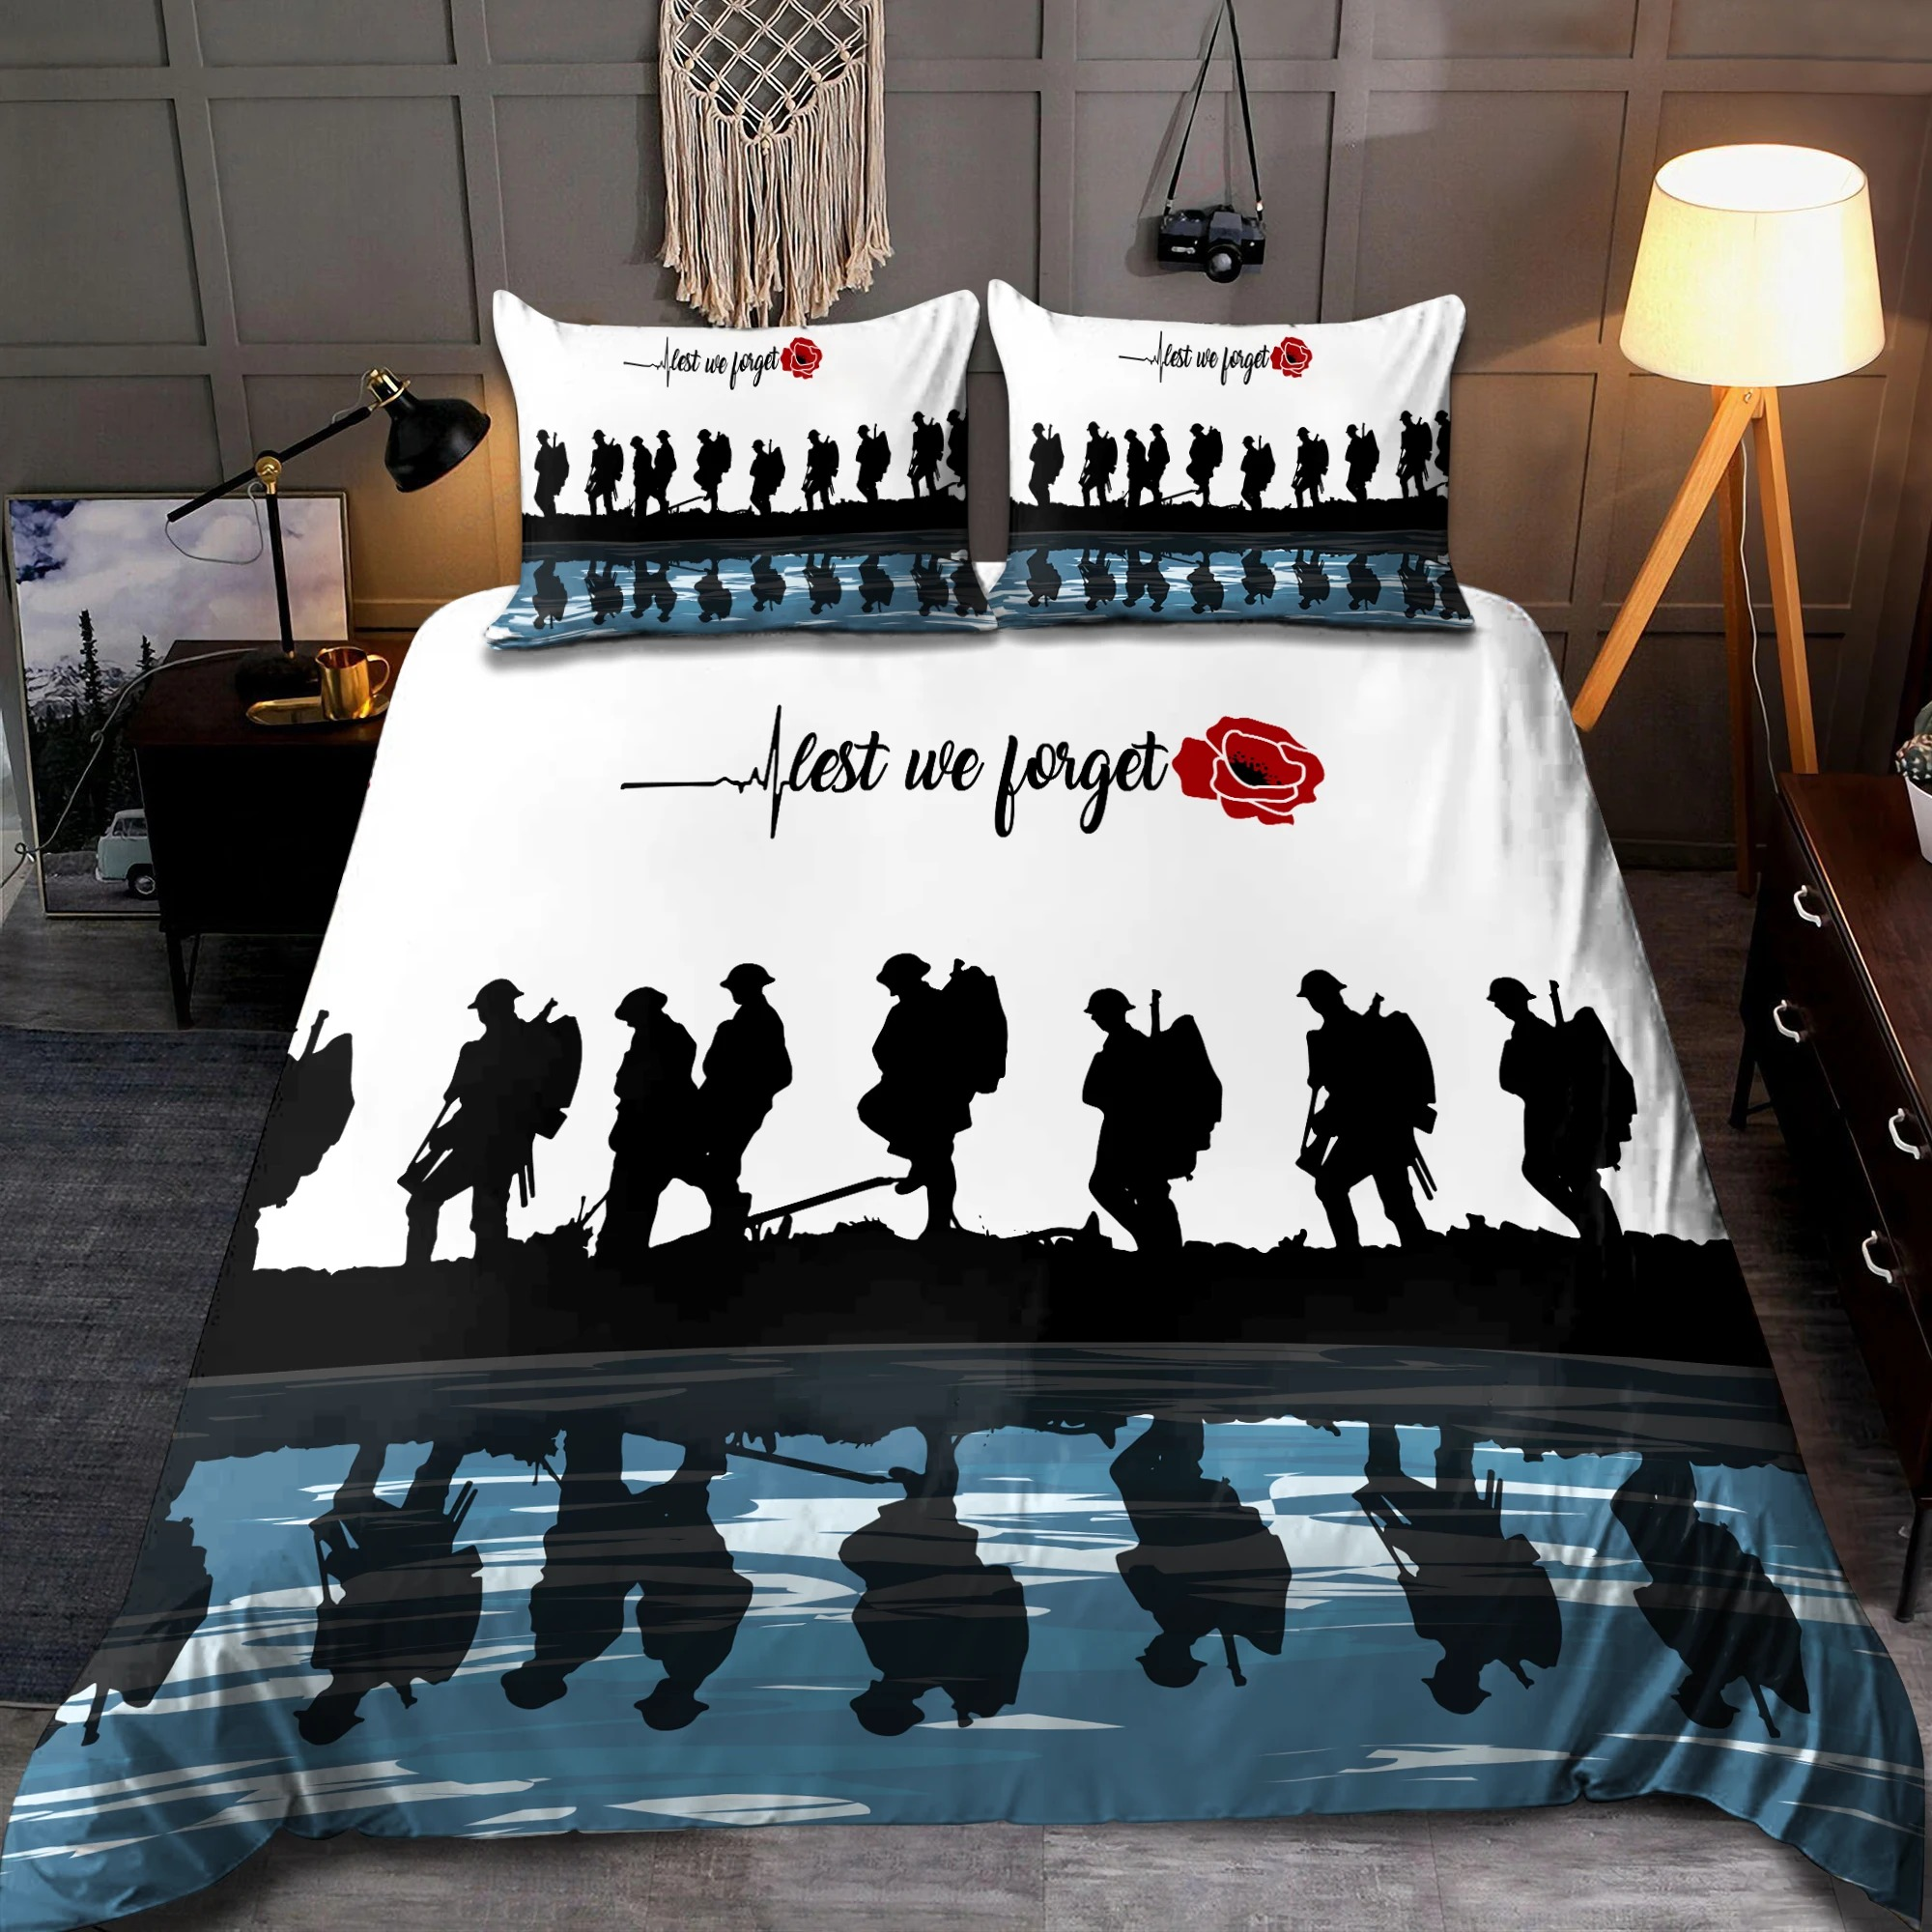 UK Veteran Let we forget honor the fallen bedding set 2